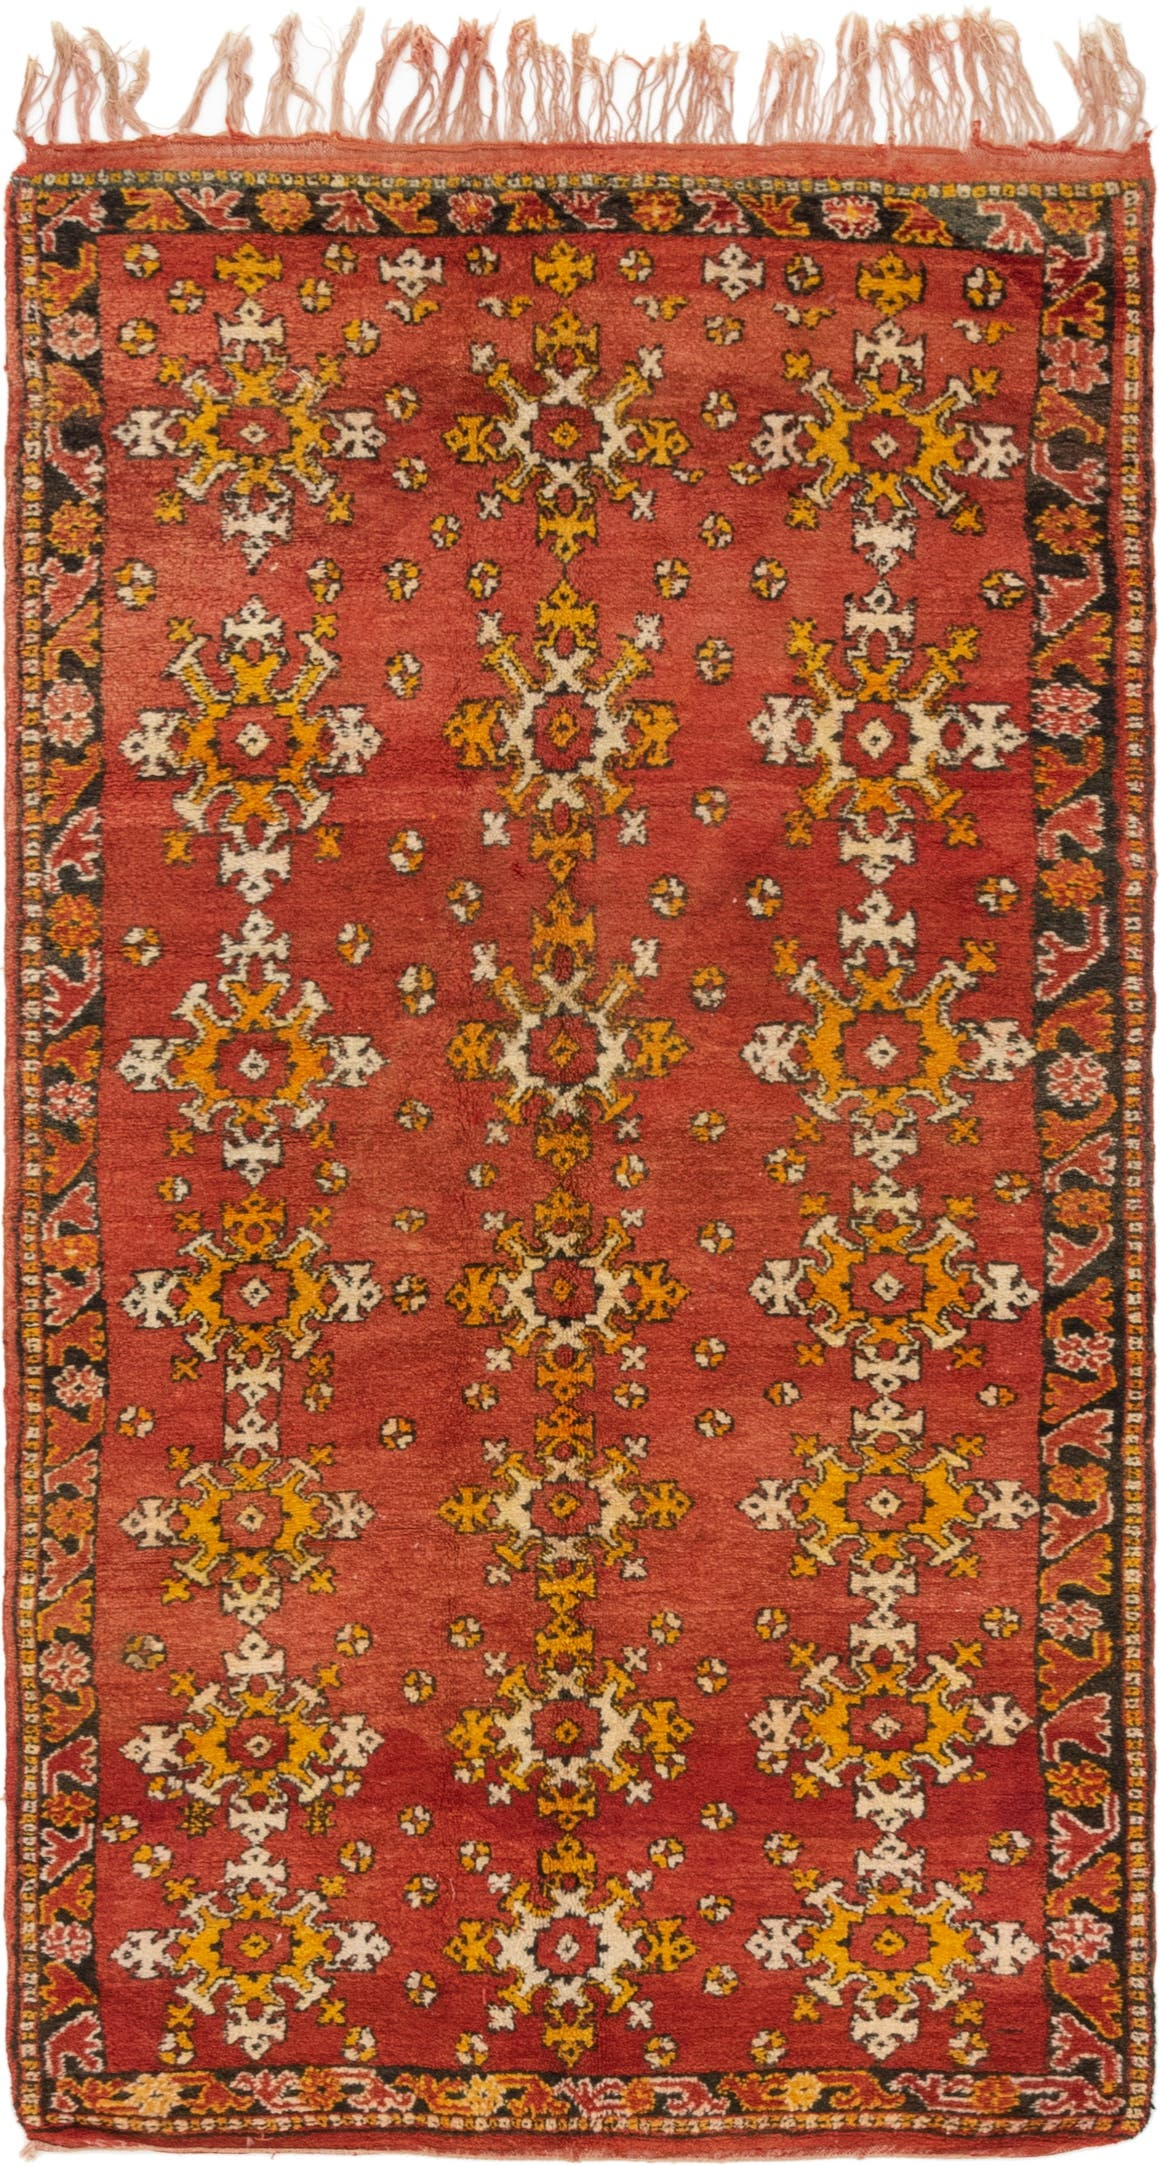 4' 4 x 7' 10 Moroccan Rug main image